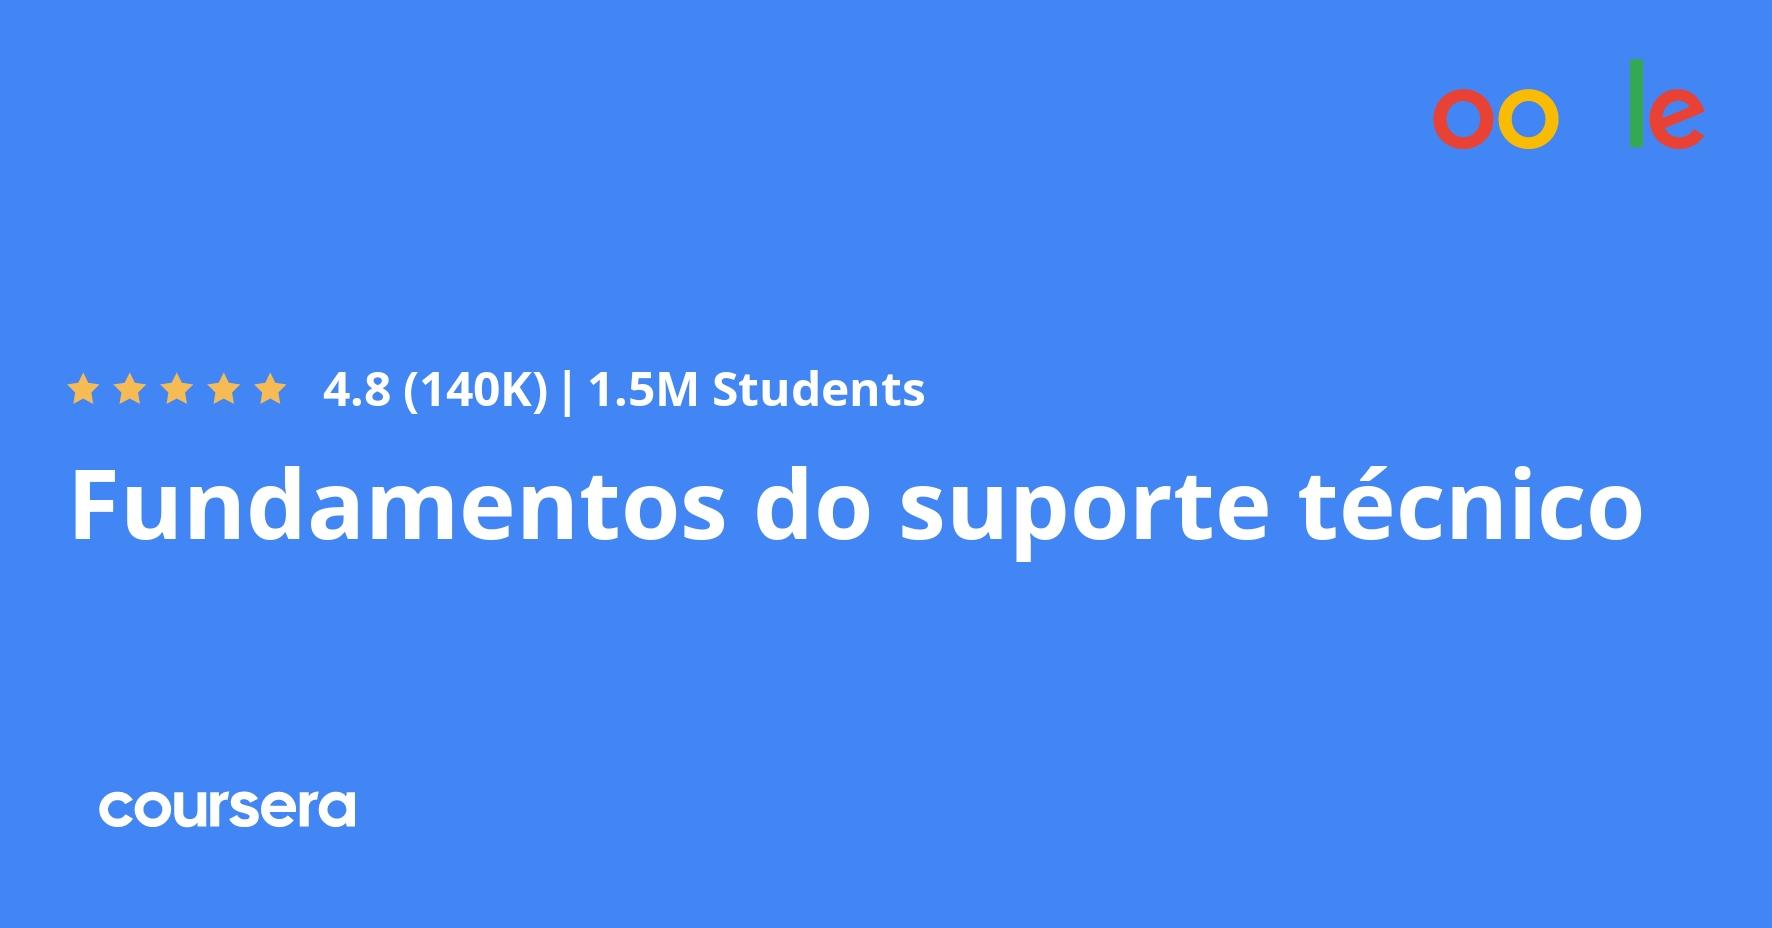 Technical Support Fundamentals